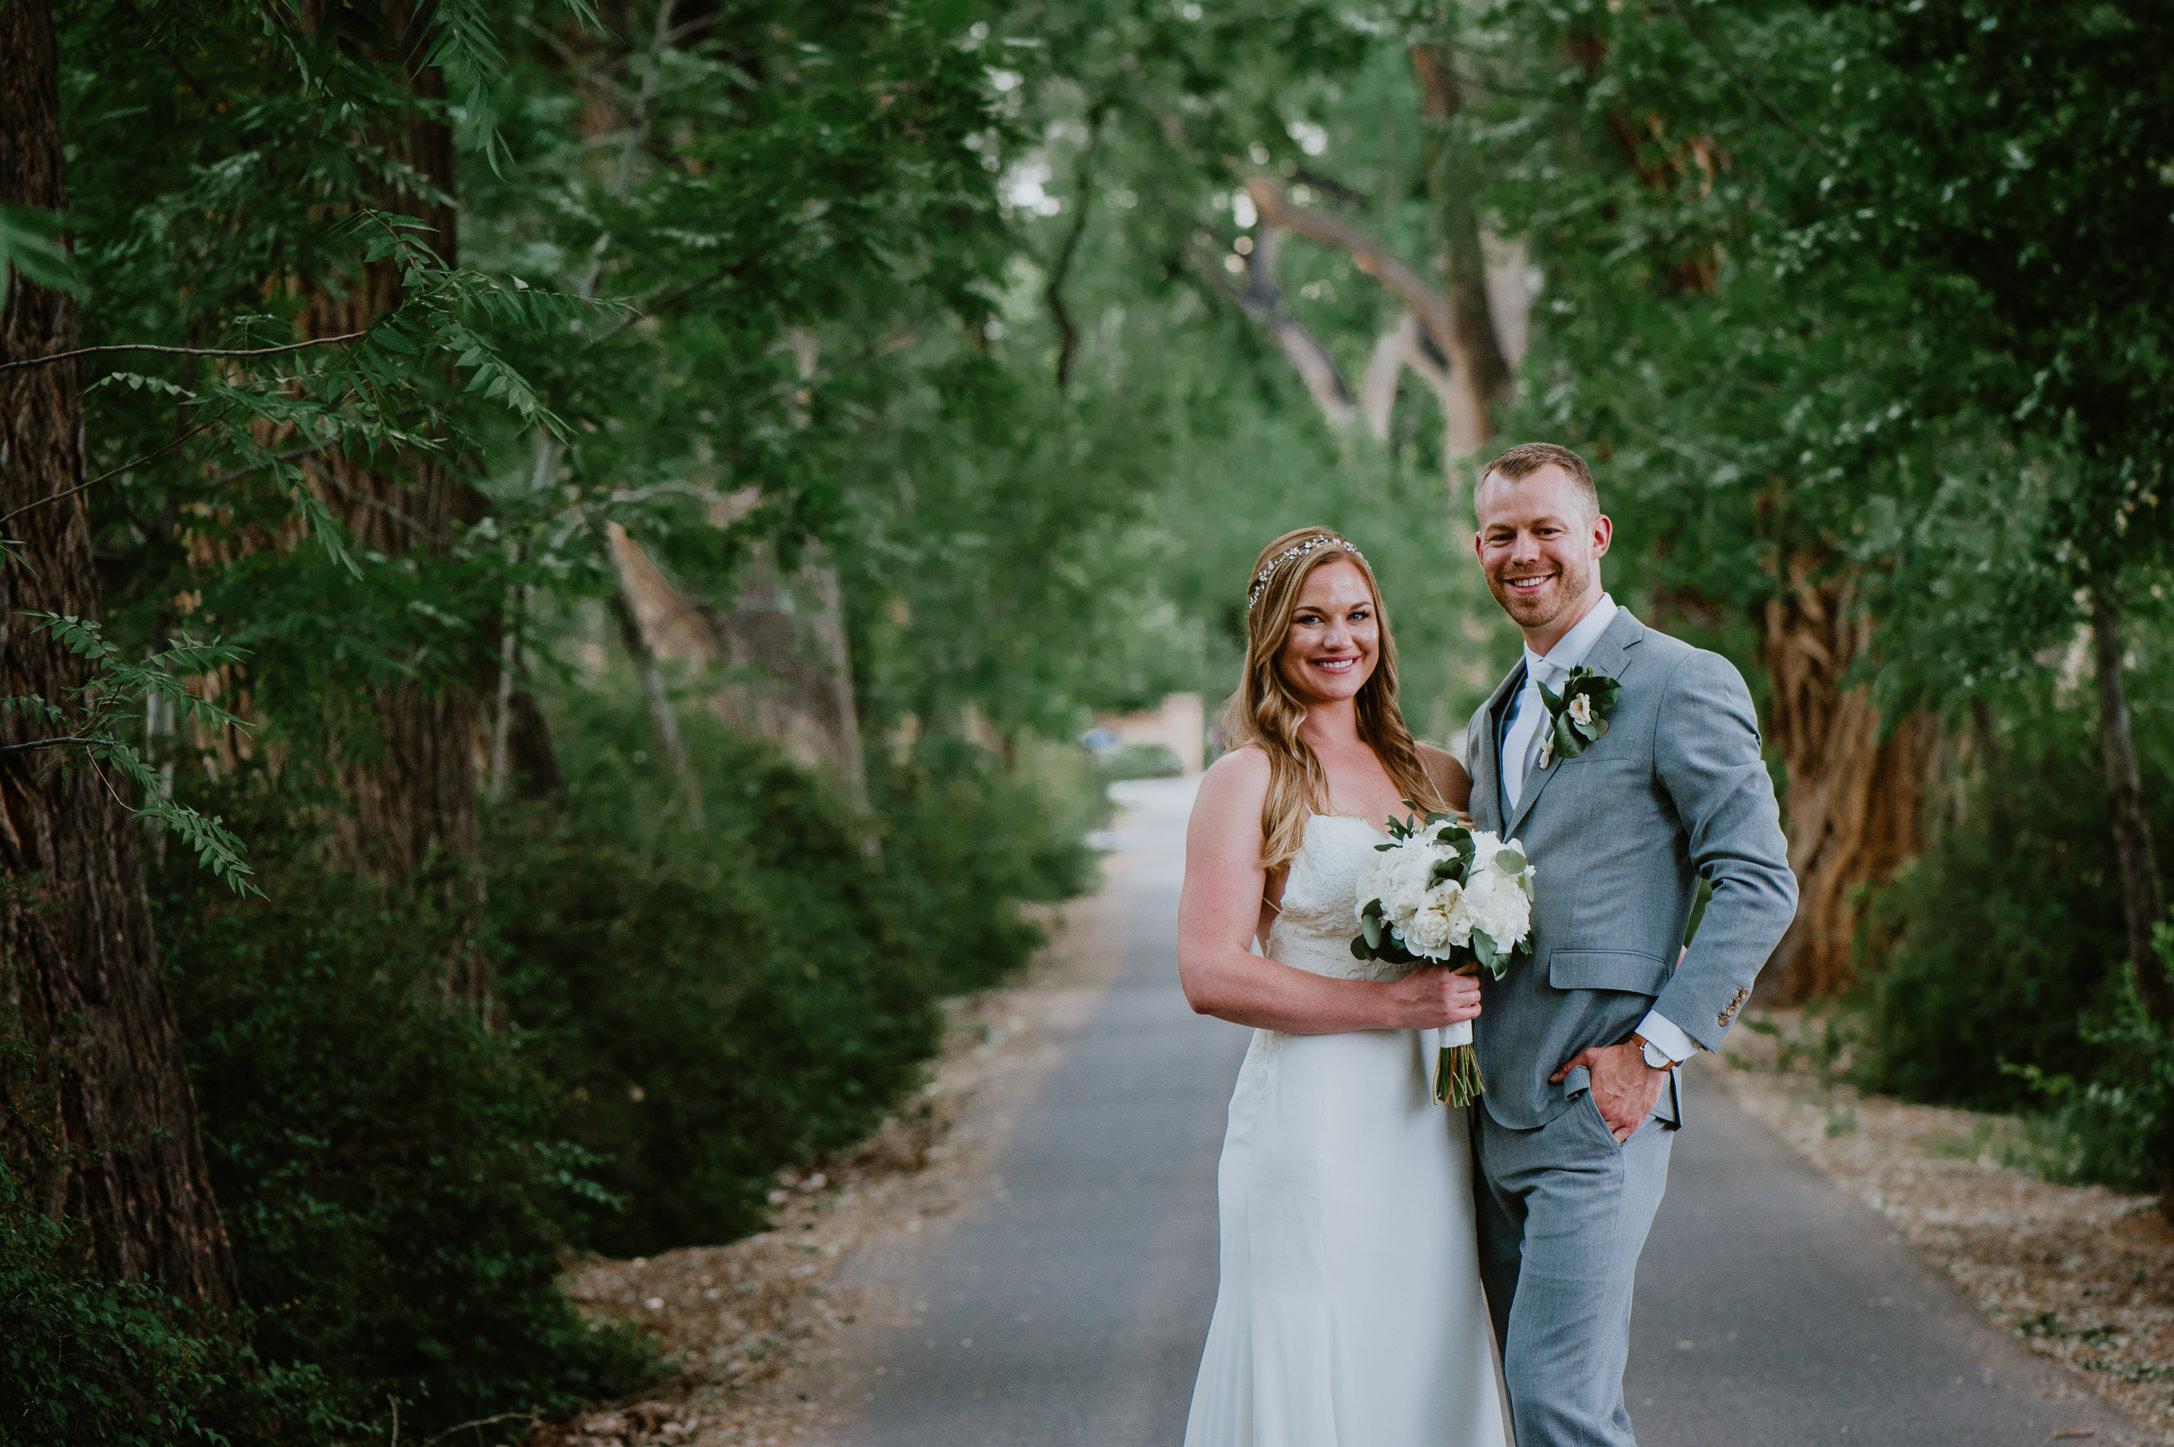 DandA-wedding-713.jpg